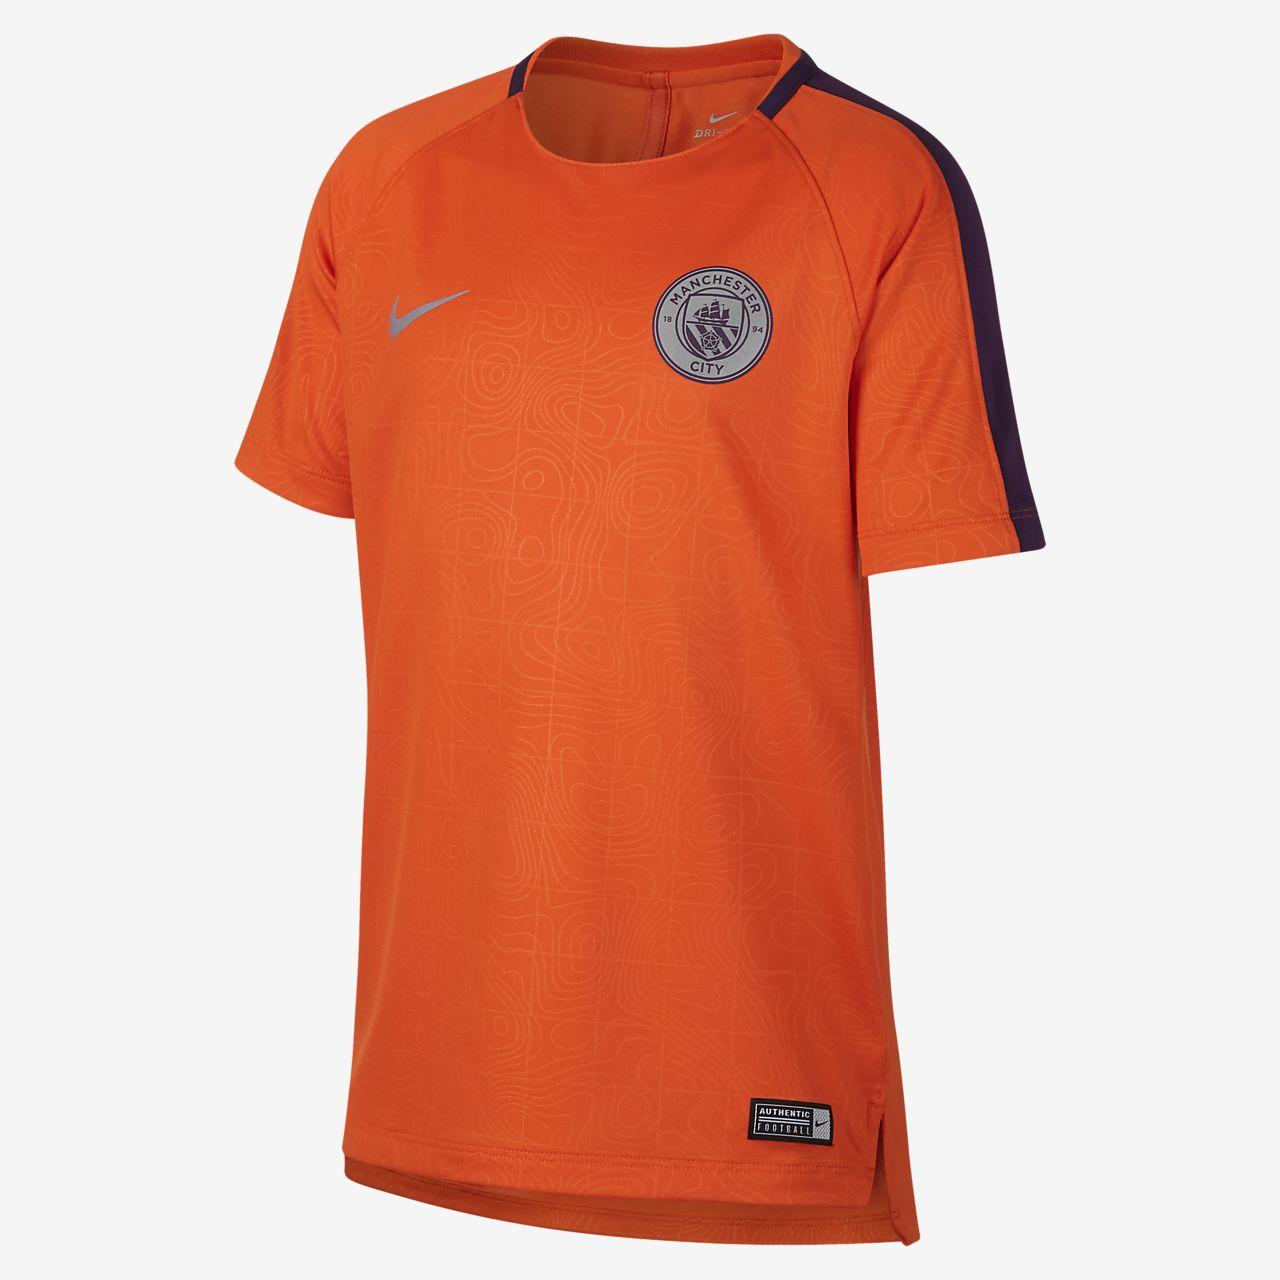 24a57dafa16ba Manchester City FC Dri-FIT Squad Camiseta de fútbol - Niño a. Nike ...